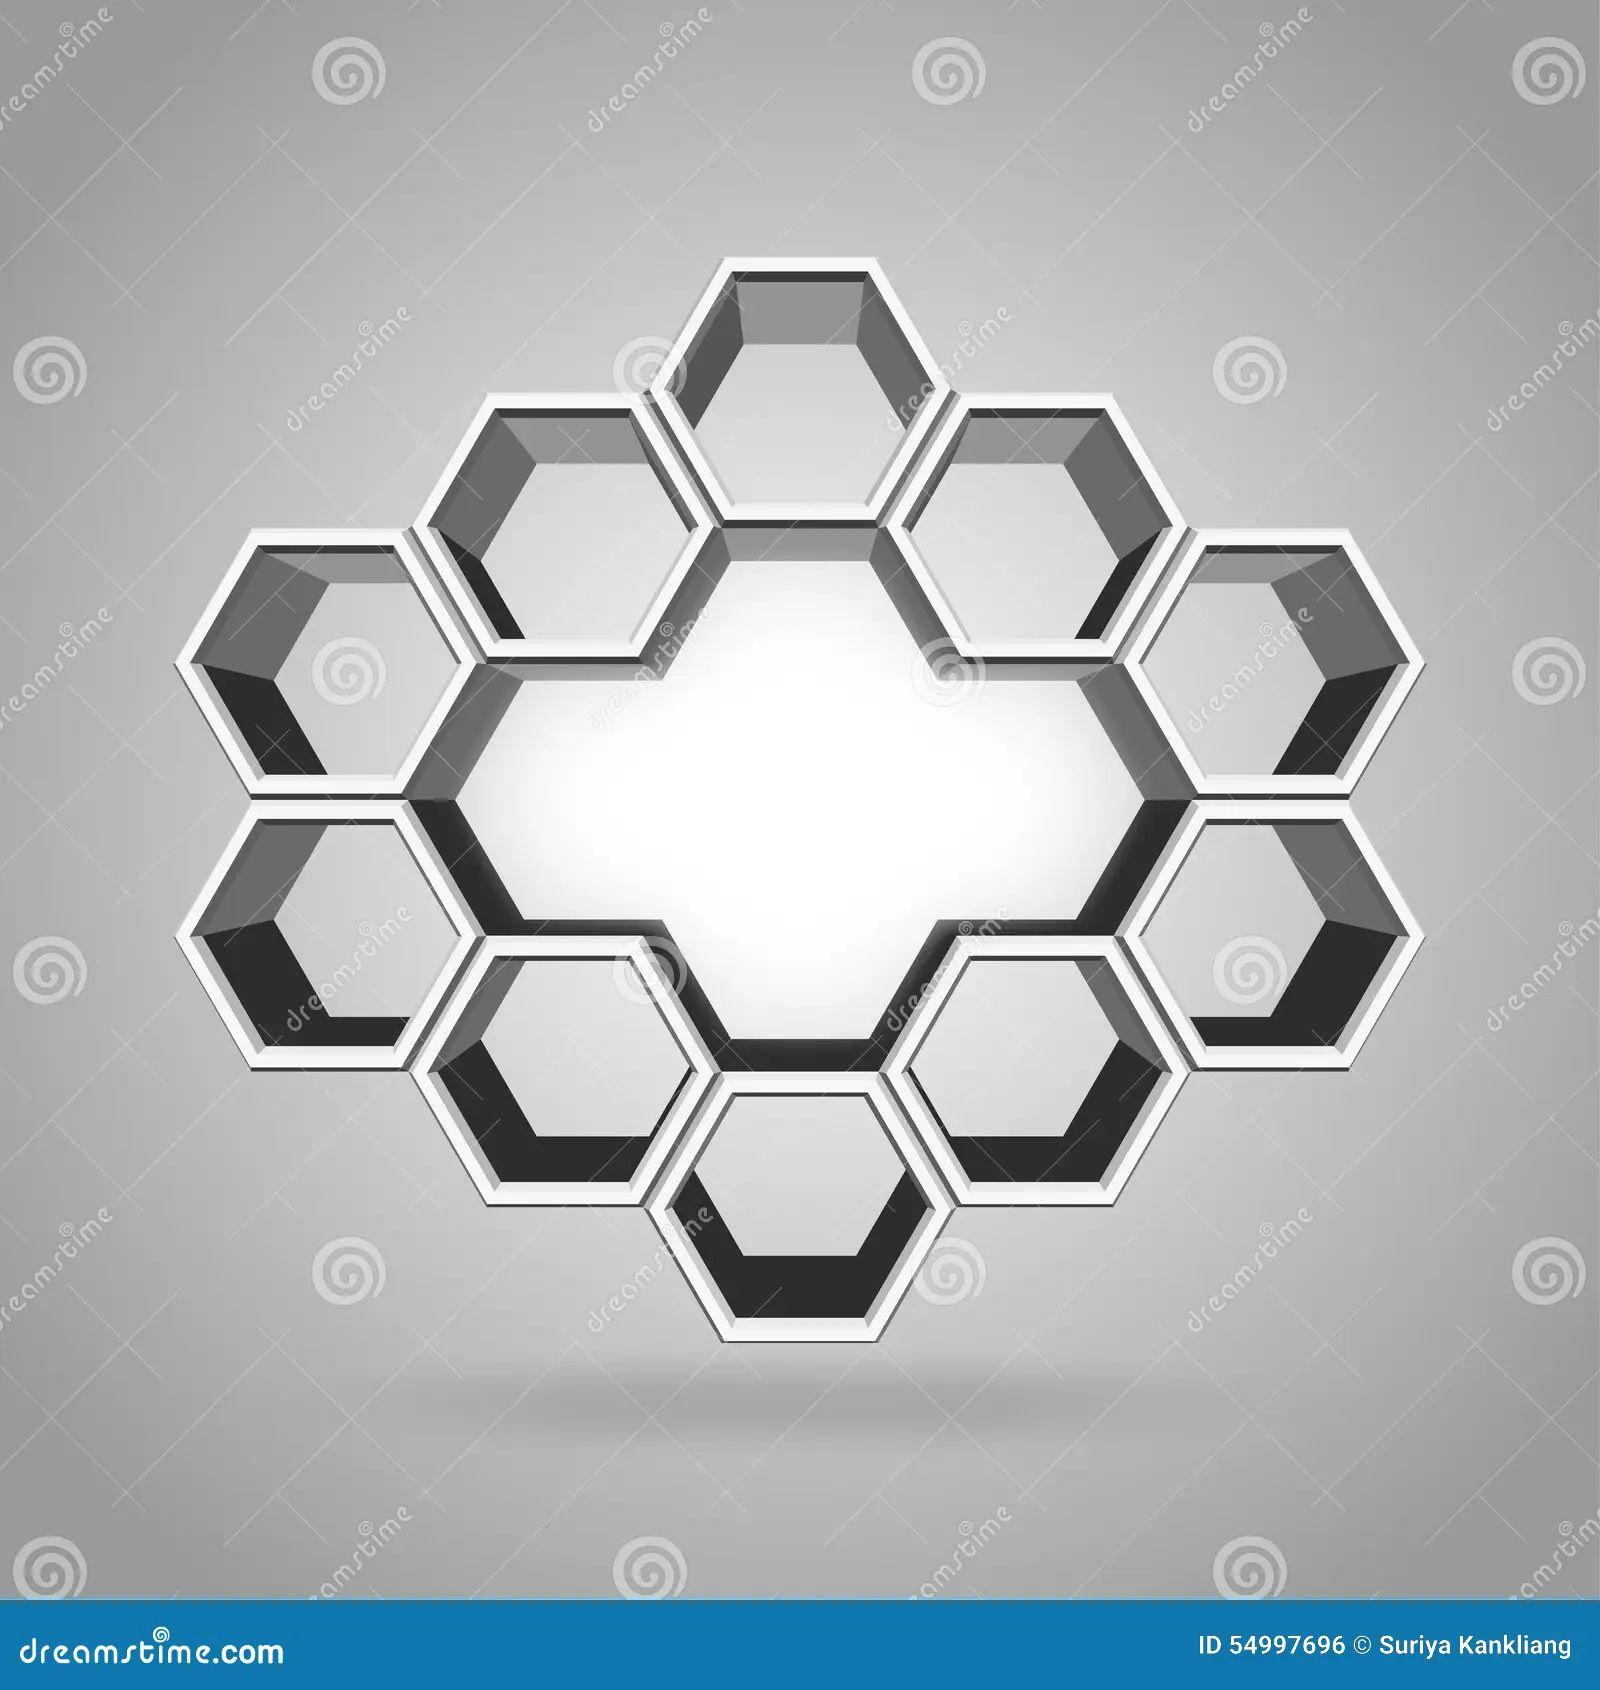 Royalty free vector hexagon pattern